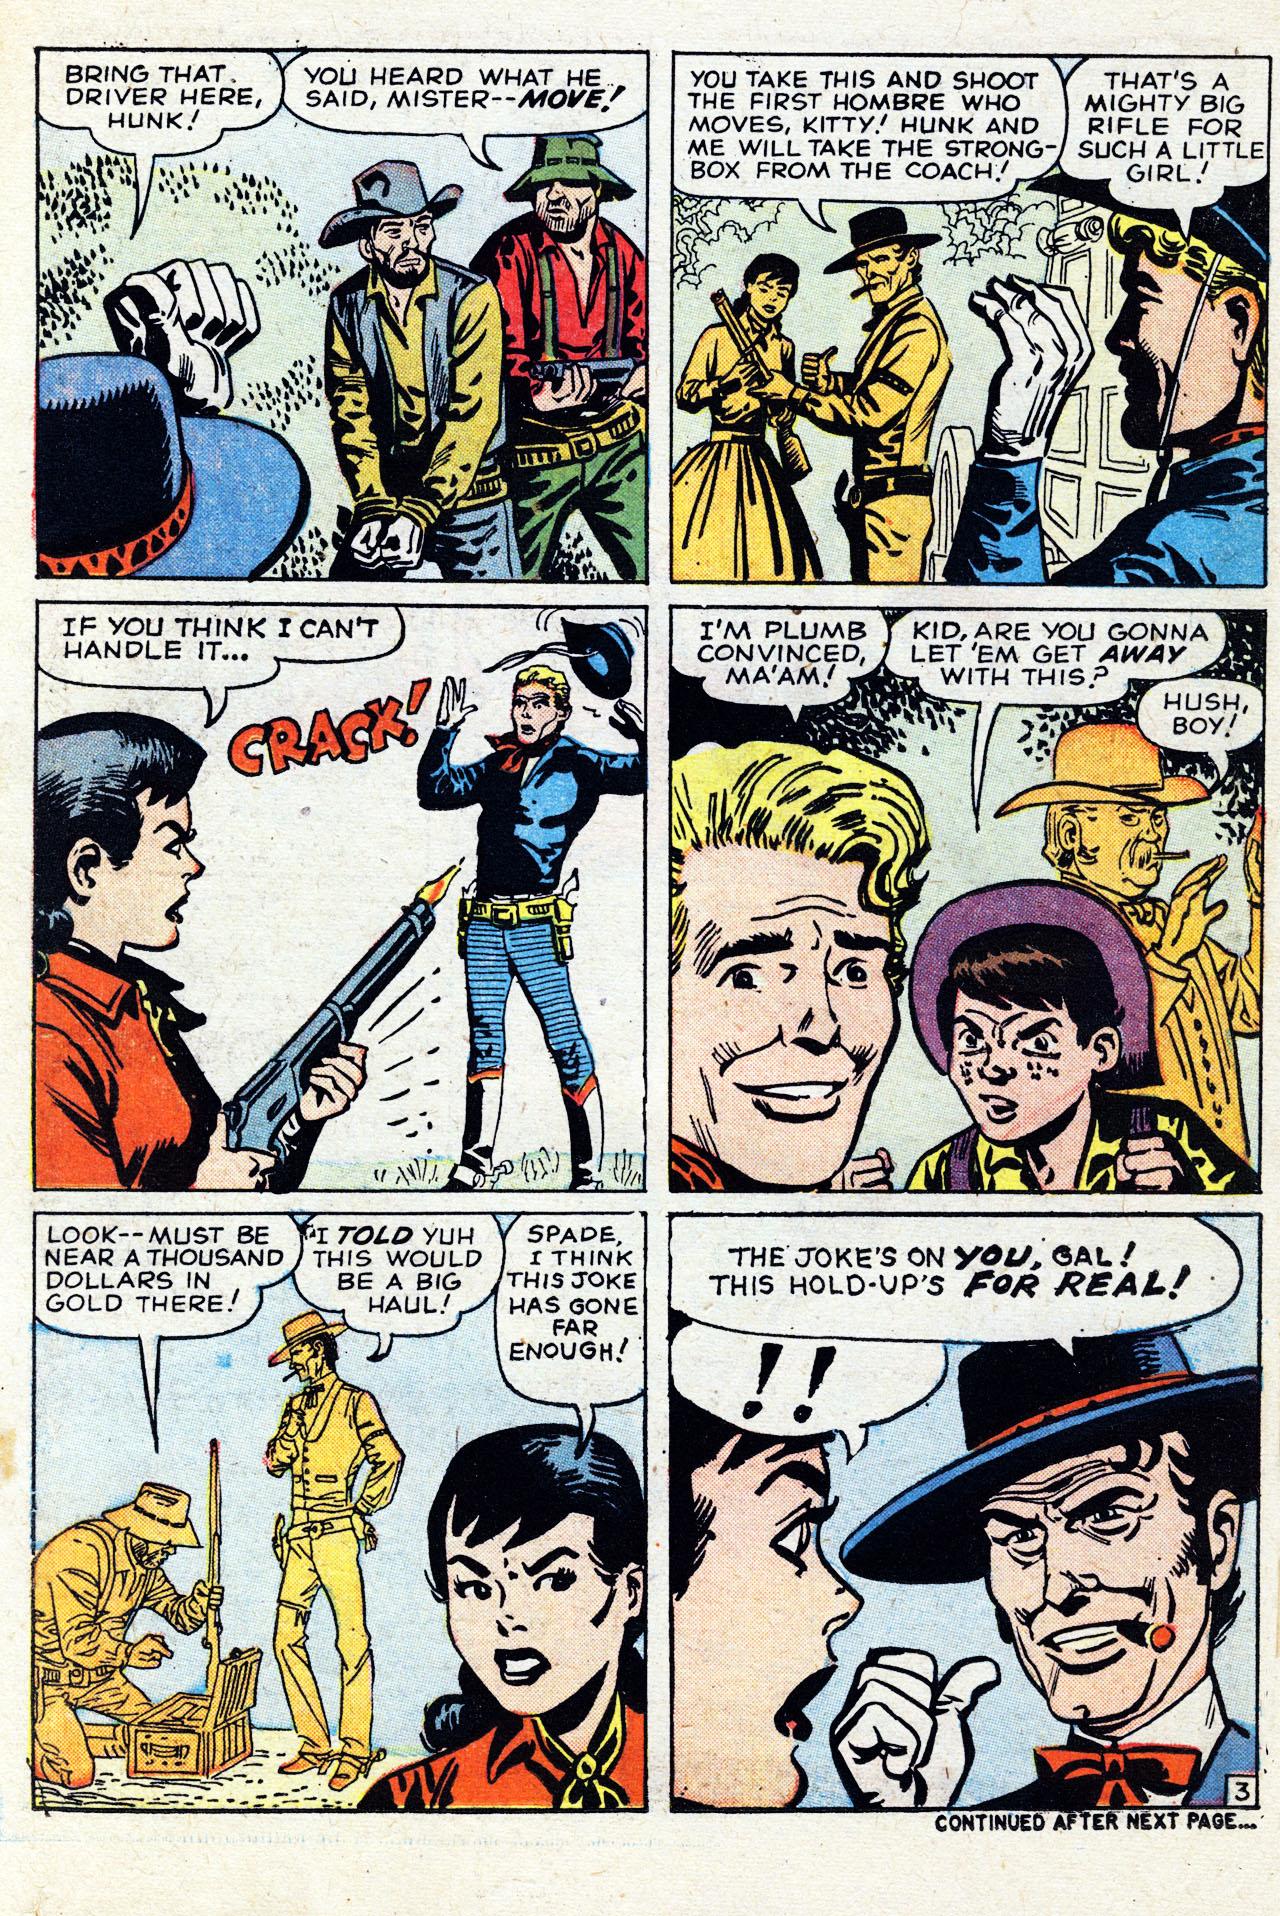 Read online Two-Gun Kid comic -  Issue #41 - 14